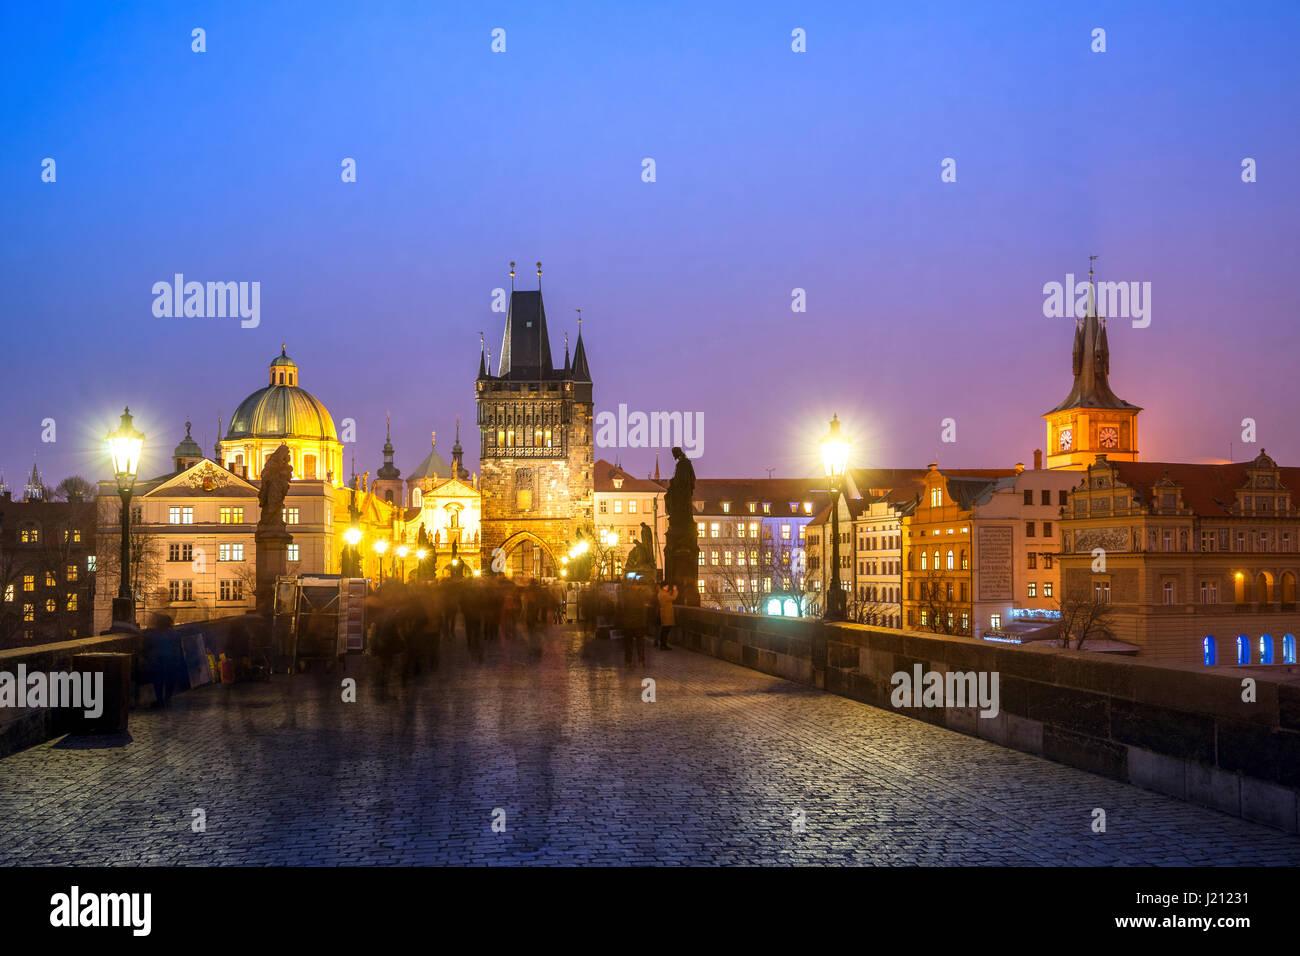 Czechia, Prague, Charles bridge at the blue hour - Stock Image